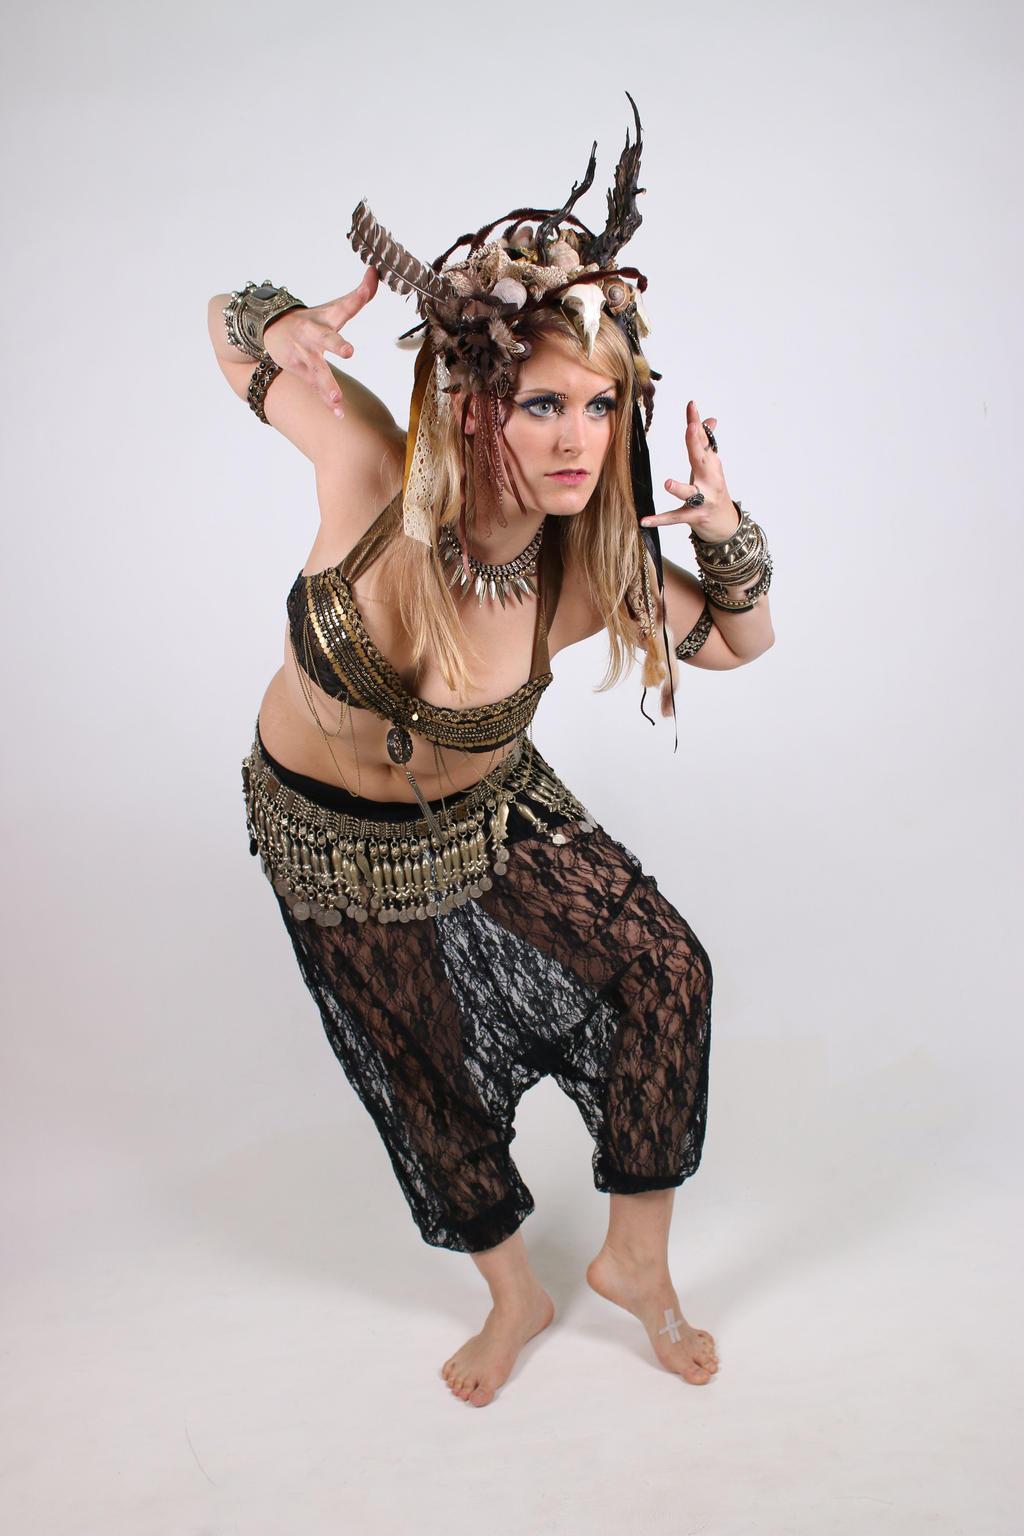 STOCK Dryad dancer II by MyladyTane